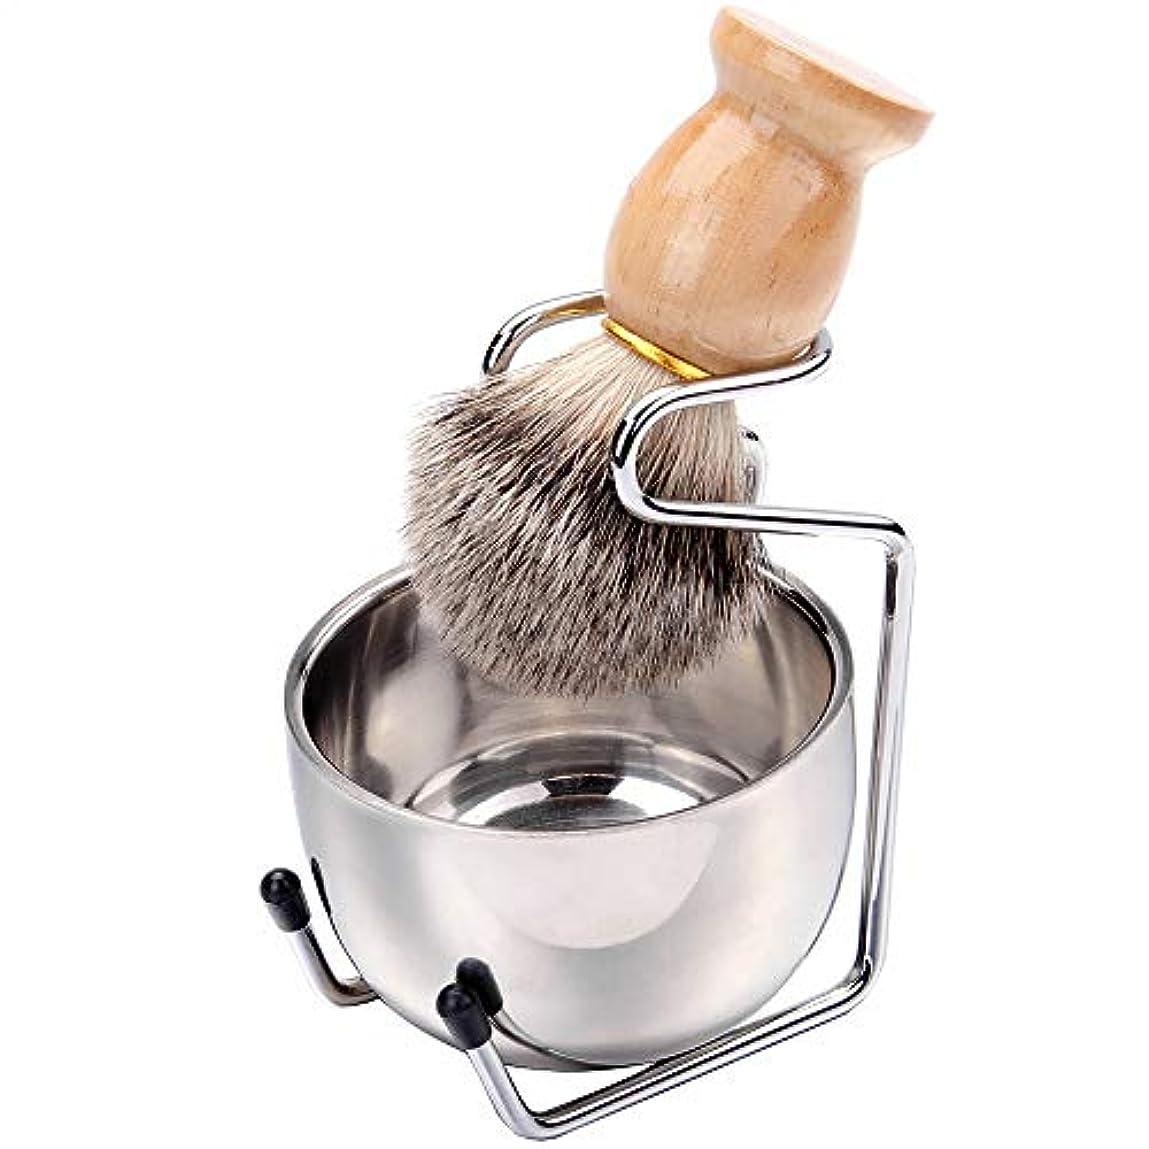 Men's Shaving Tool, 3-piece Beard Care Set Soap Bowl Hanger Brush Facial